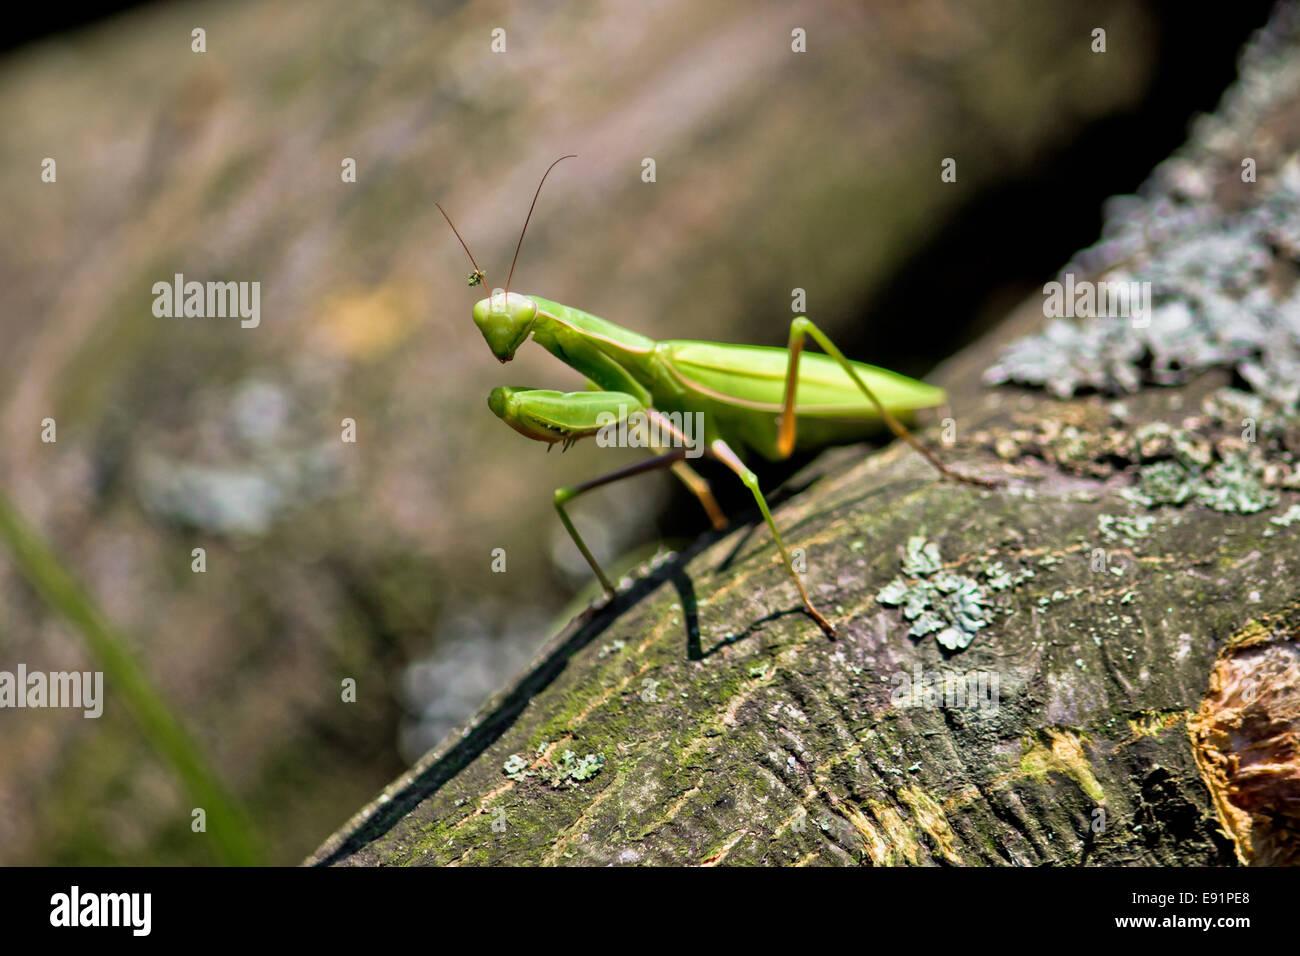 Praying Mantis in natural environment Stock Photo, Royalty Free ...